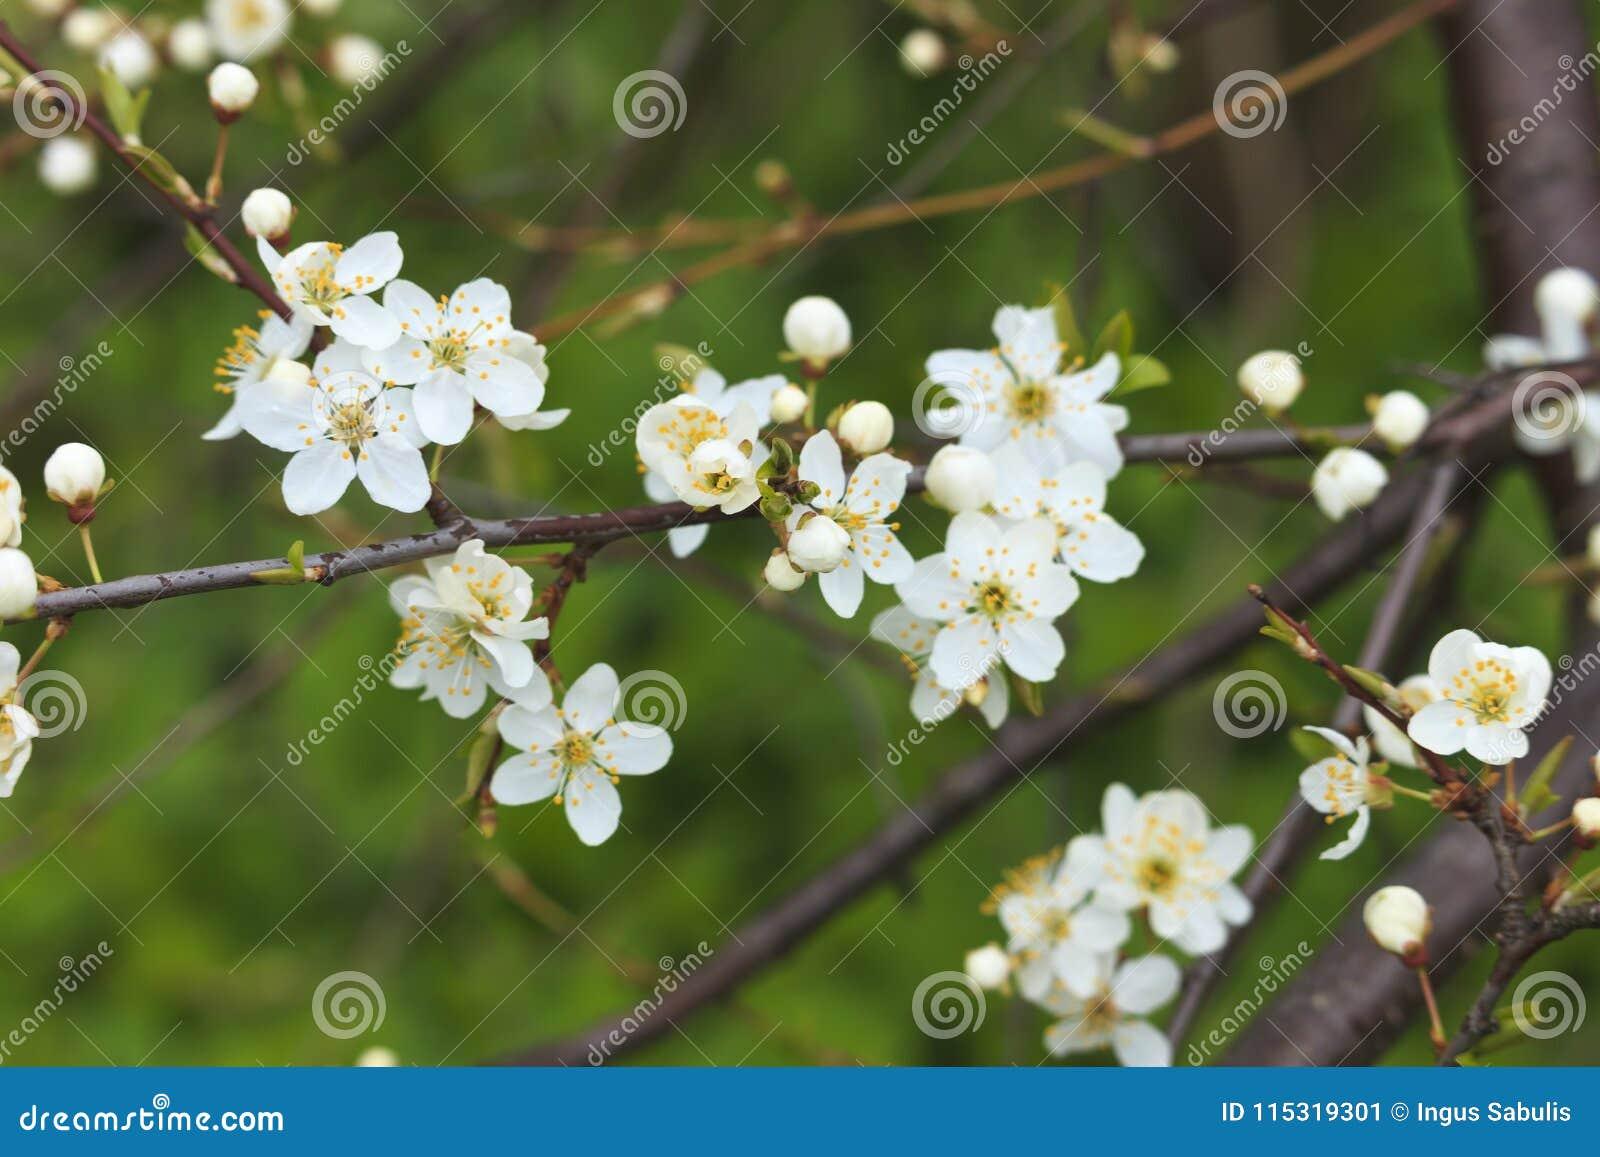 Blooming wild plum tree in daylight stock image image of blooming wild plum tree in daylight white flowers in small clusters on a wild plum tree branch mightylinksfo